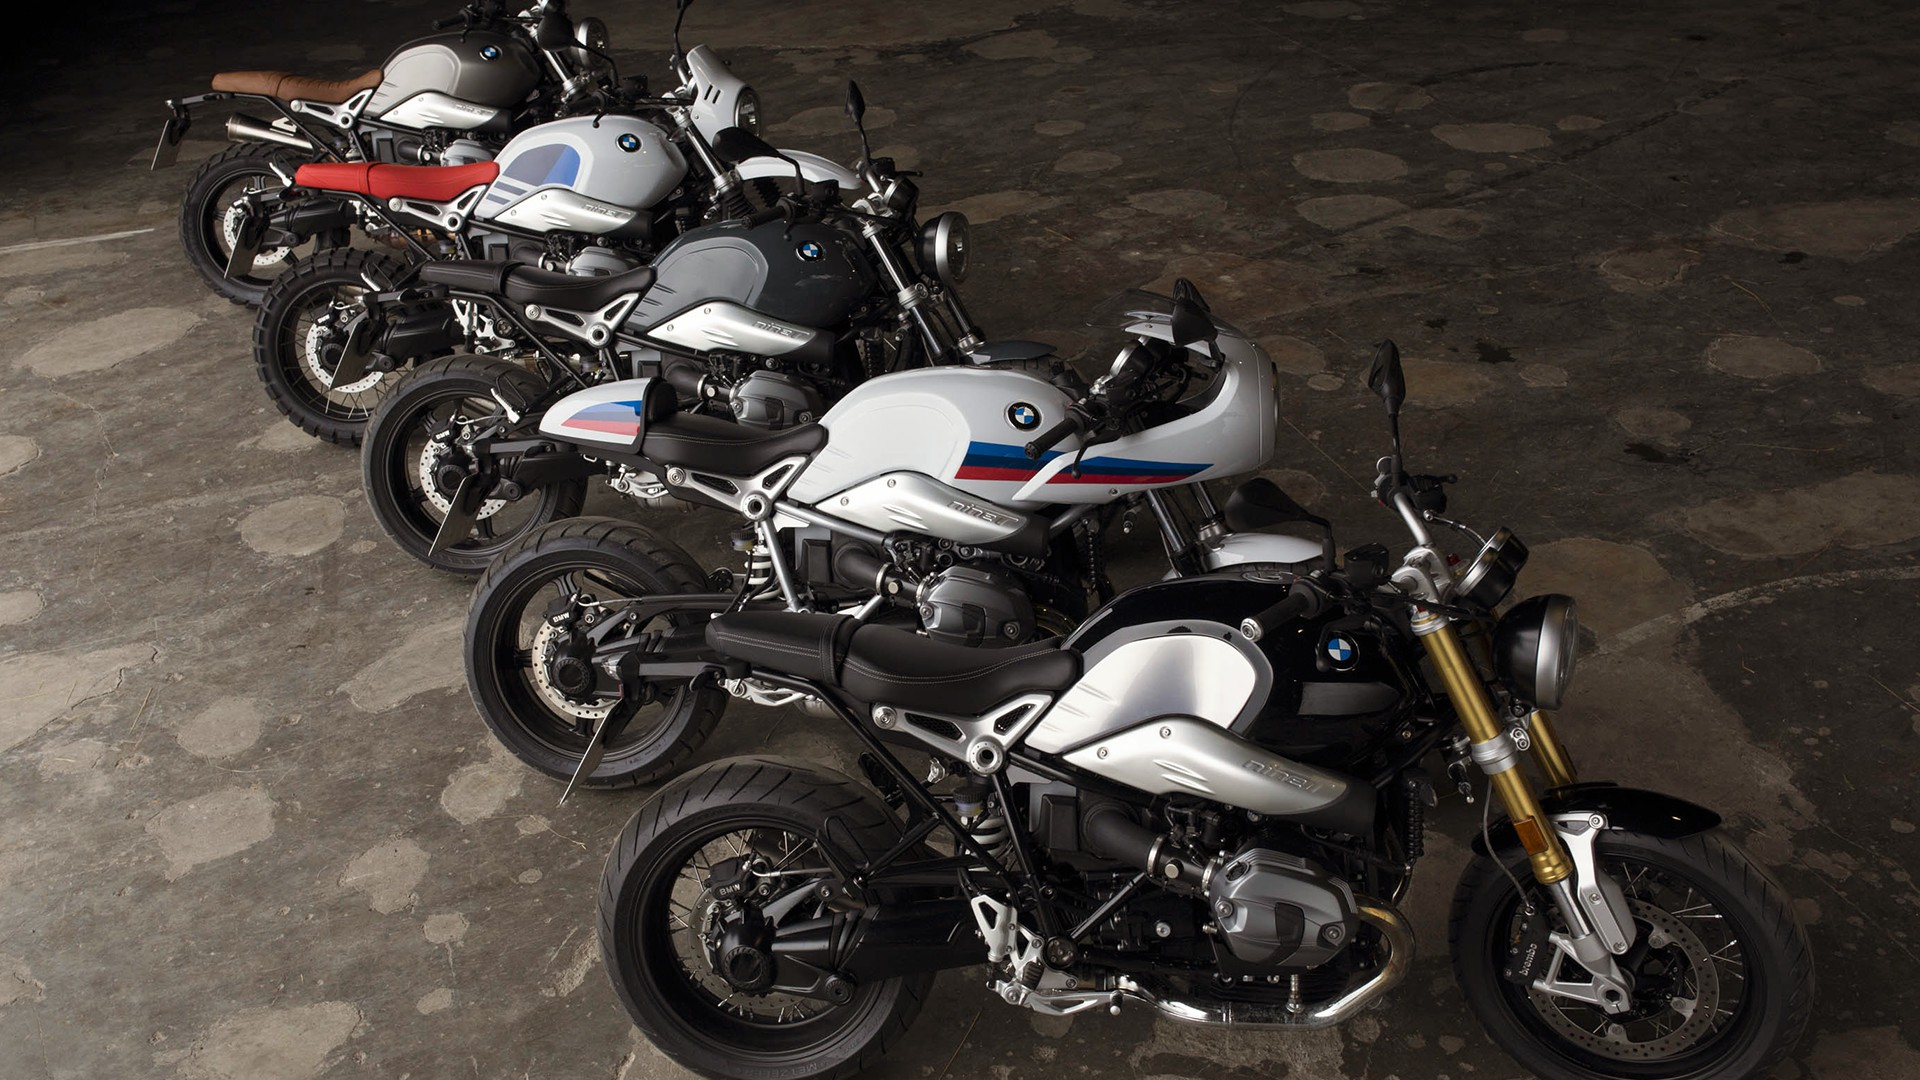 BMW RnineT lineup